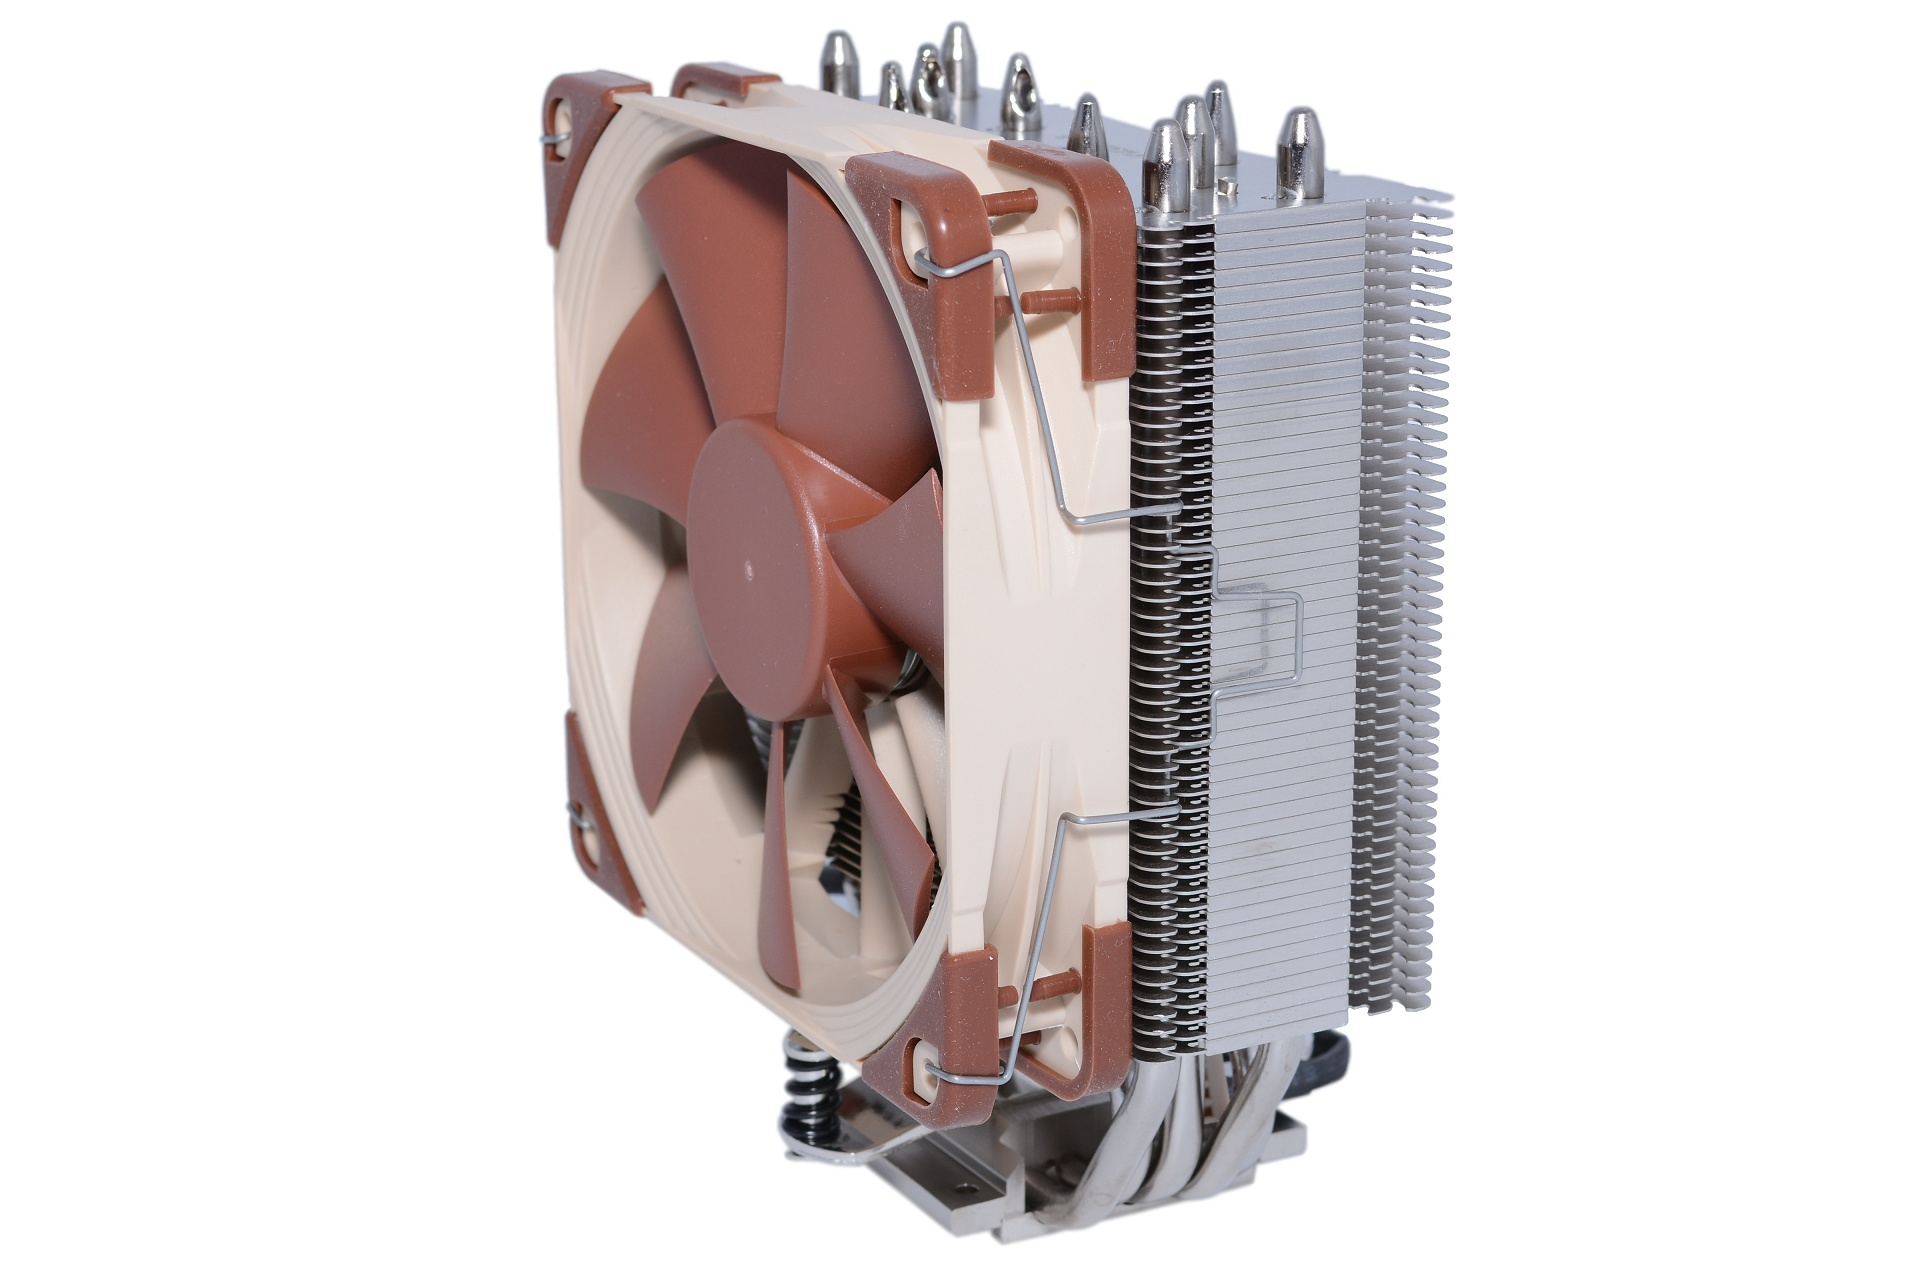 The Best Cpu Coolers 10 Way Roundup Techspot